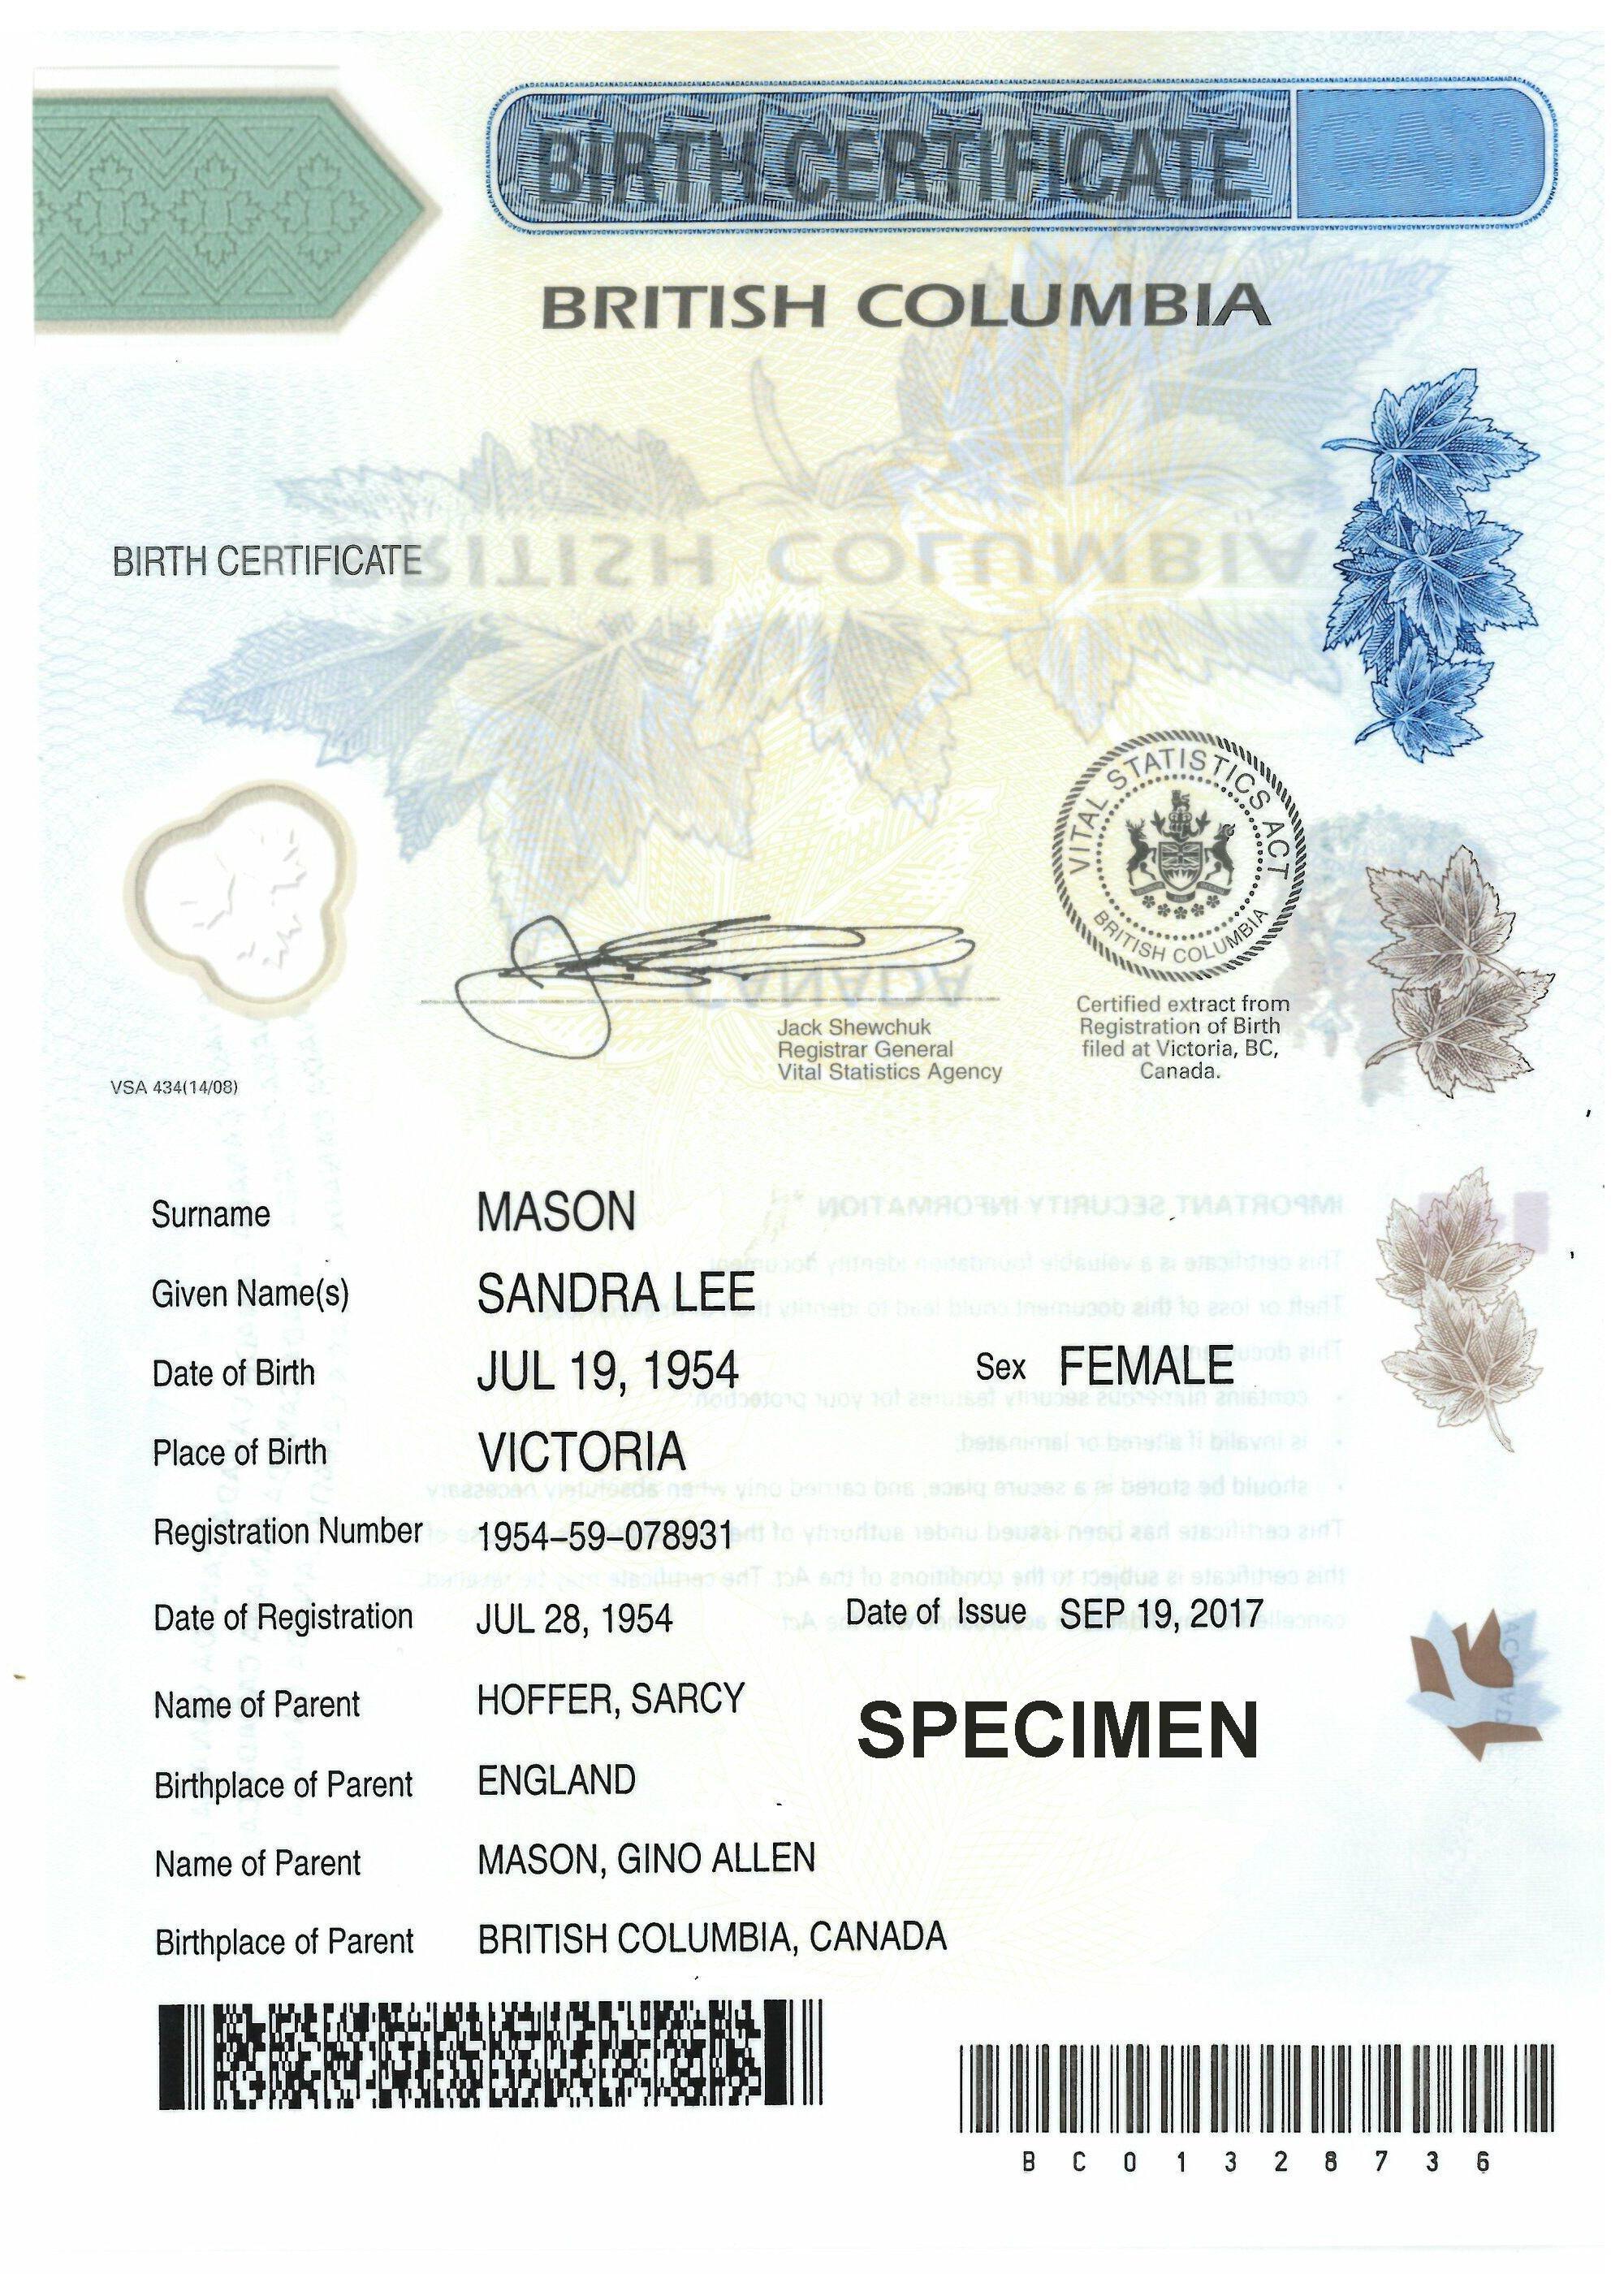 birth certificate canadian form british declaration legal application columbia german canada bc visa change immigration gender sample certificates parental copy